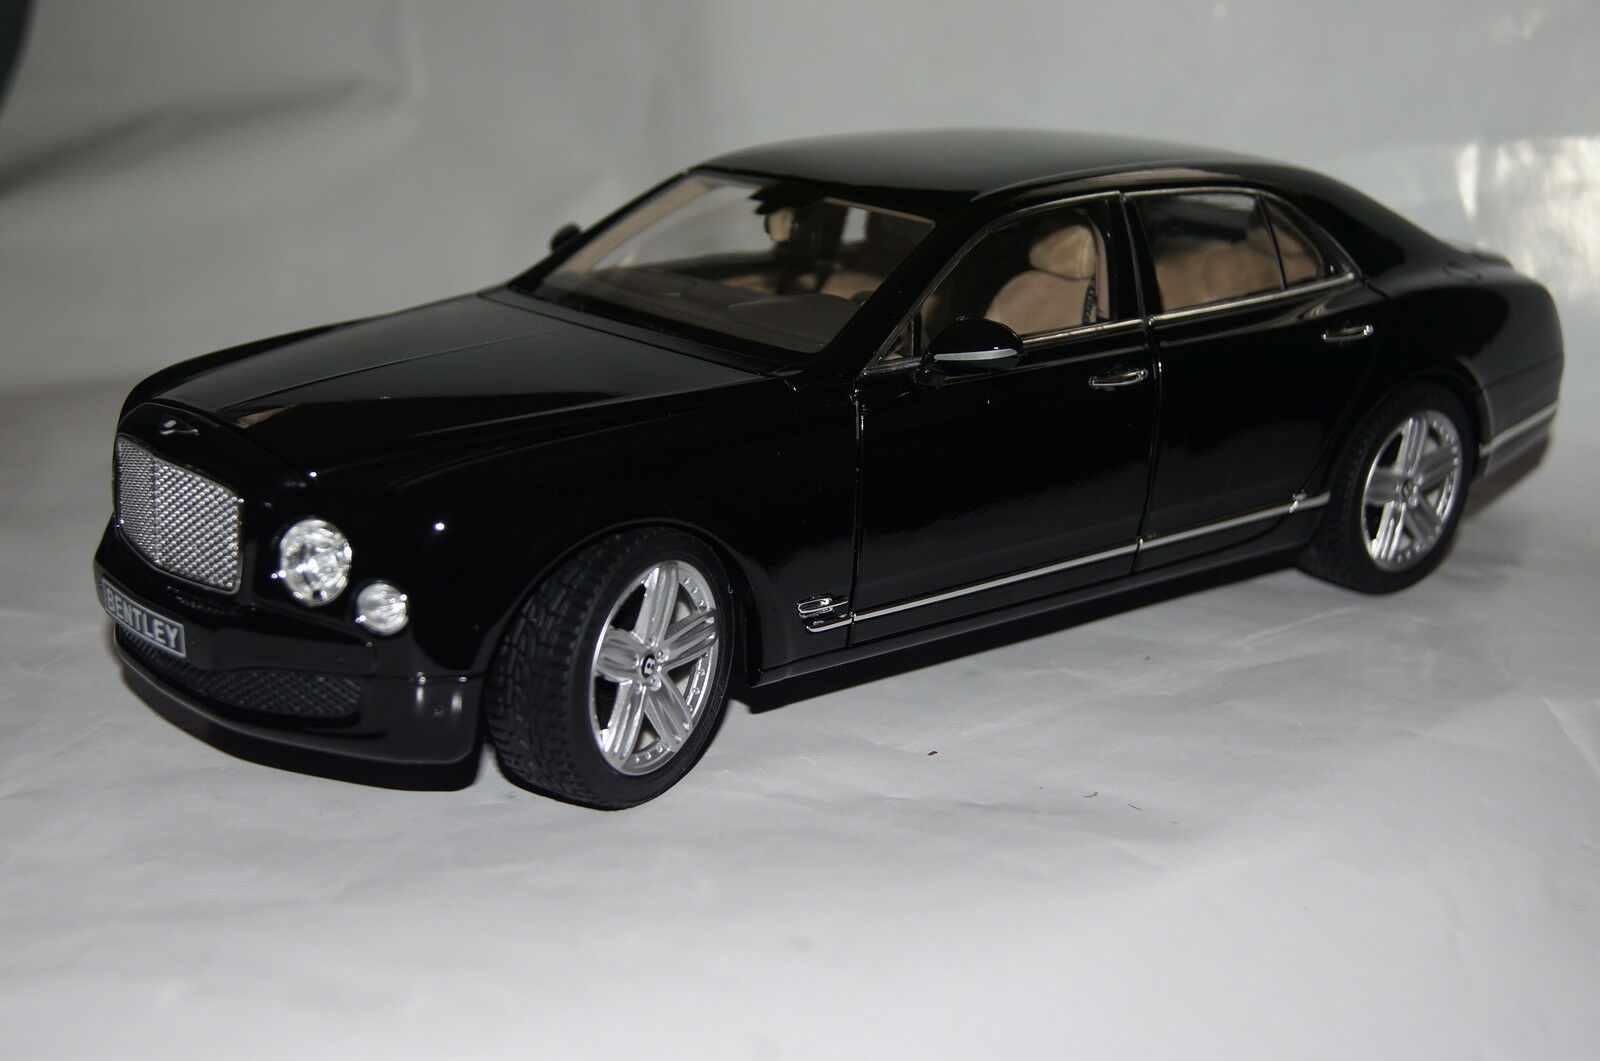 Bentley Mulsanne Noir 1 18 rastar NEUF  OVP 43800bl